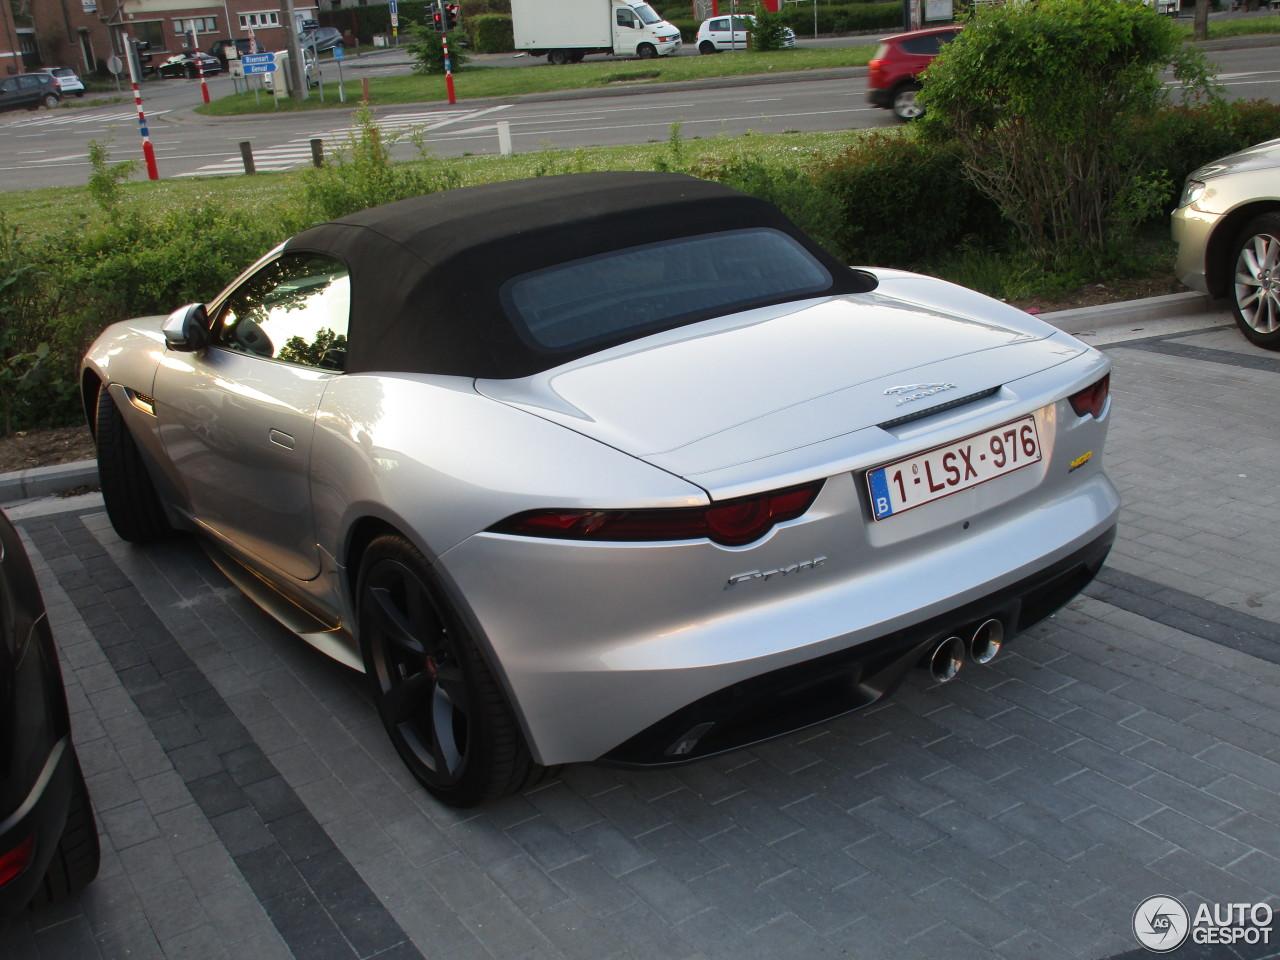 jaguar f type 400 sport convertible 4 may 2018 autogespot. Black Bedroom Furniture Sets. Home Design Ideas